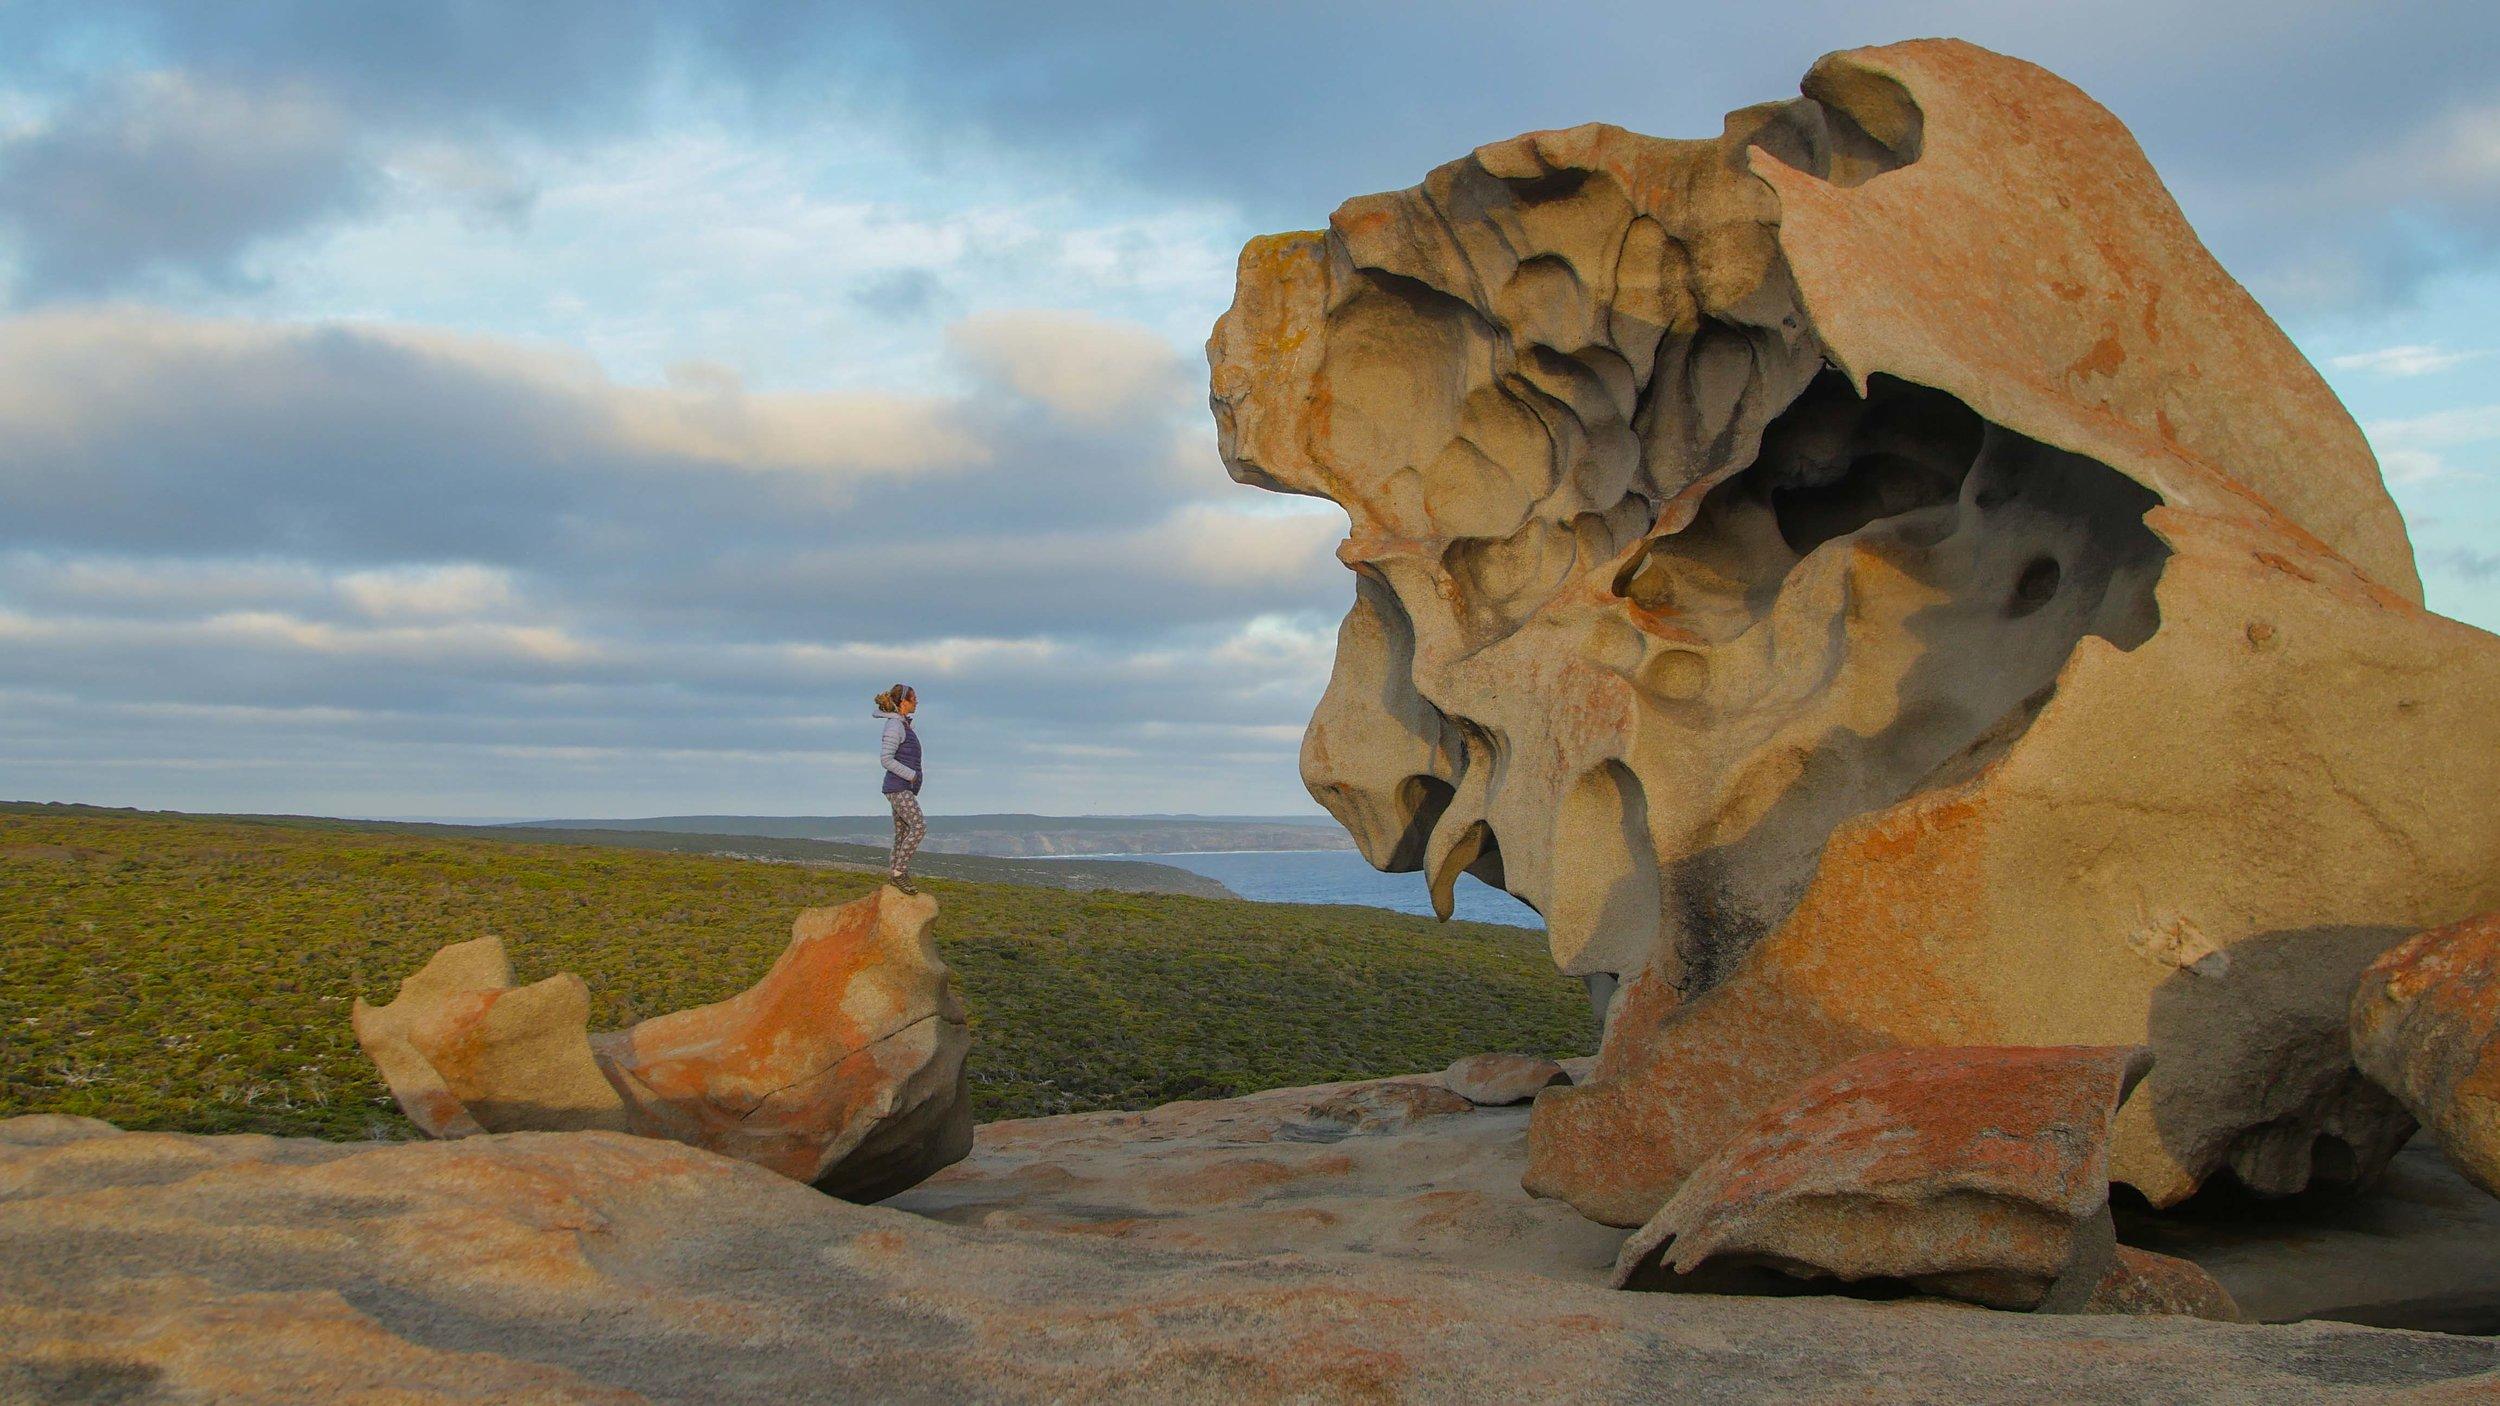 kangaroo island south australia (10 of 16).jpg